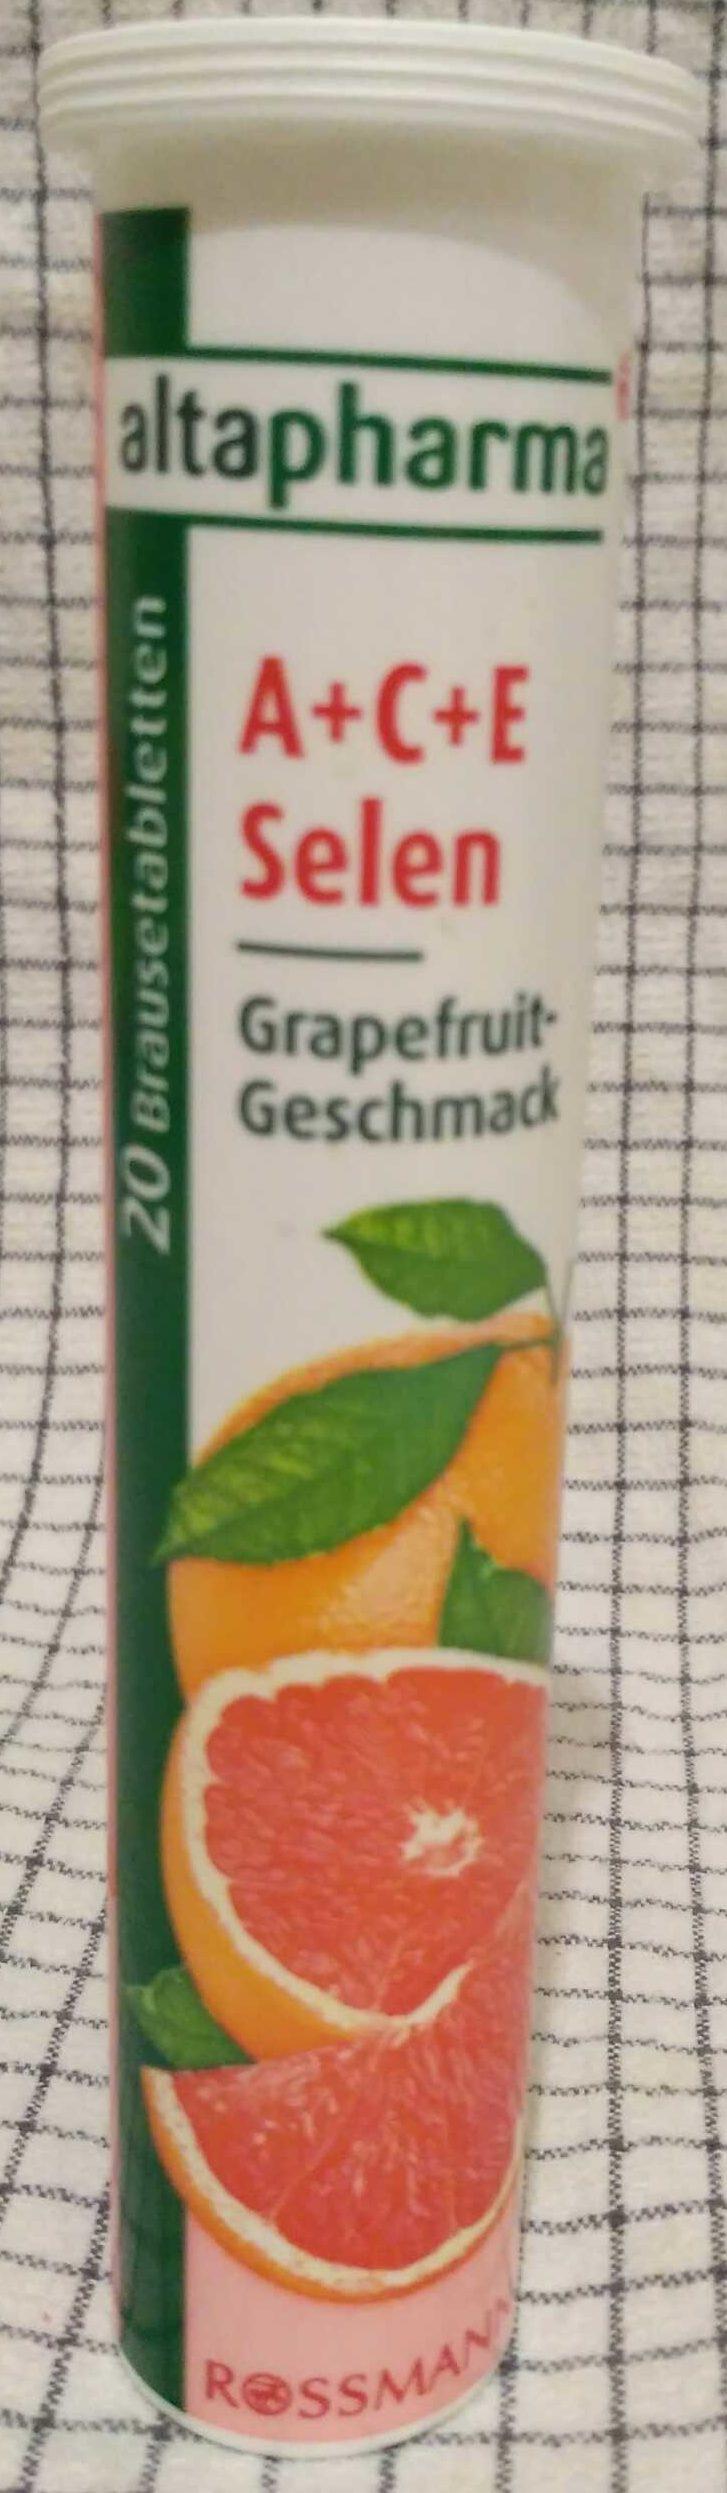 A + C + E Selen Grapefruit-Geschmack - Produit